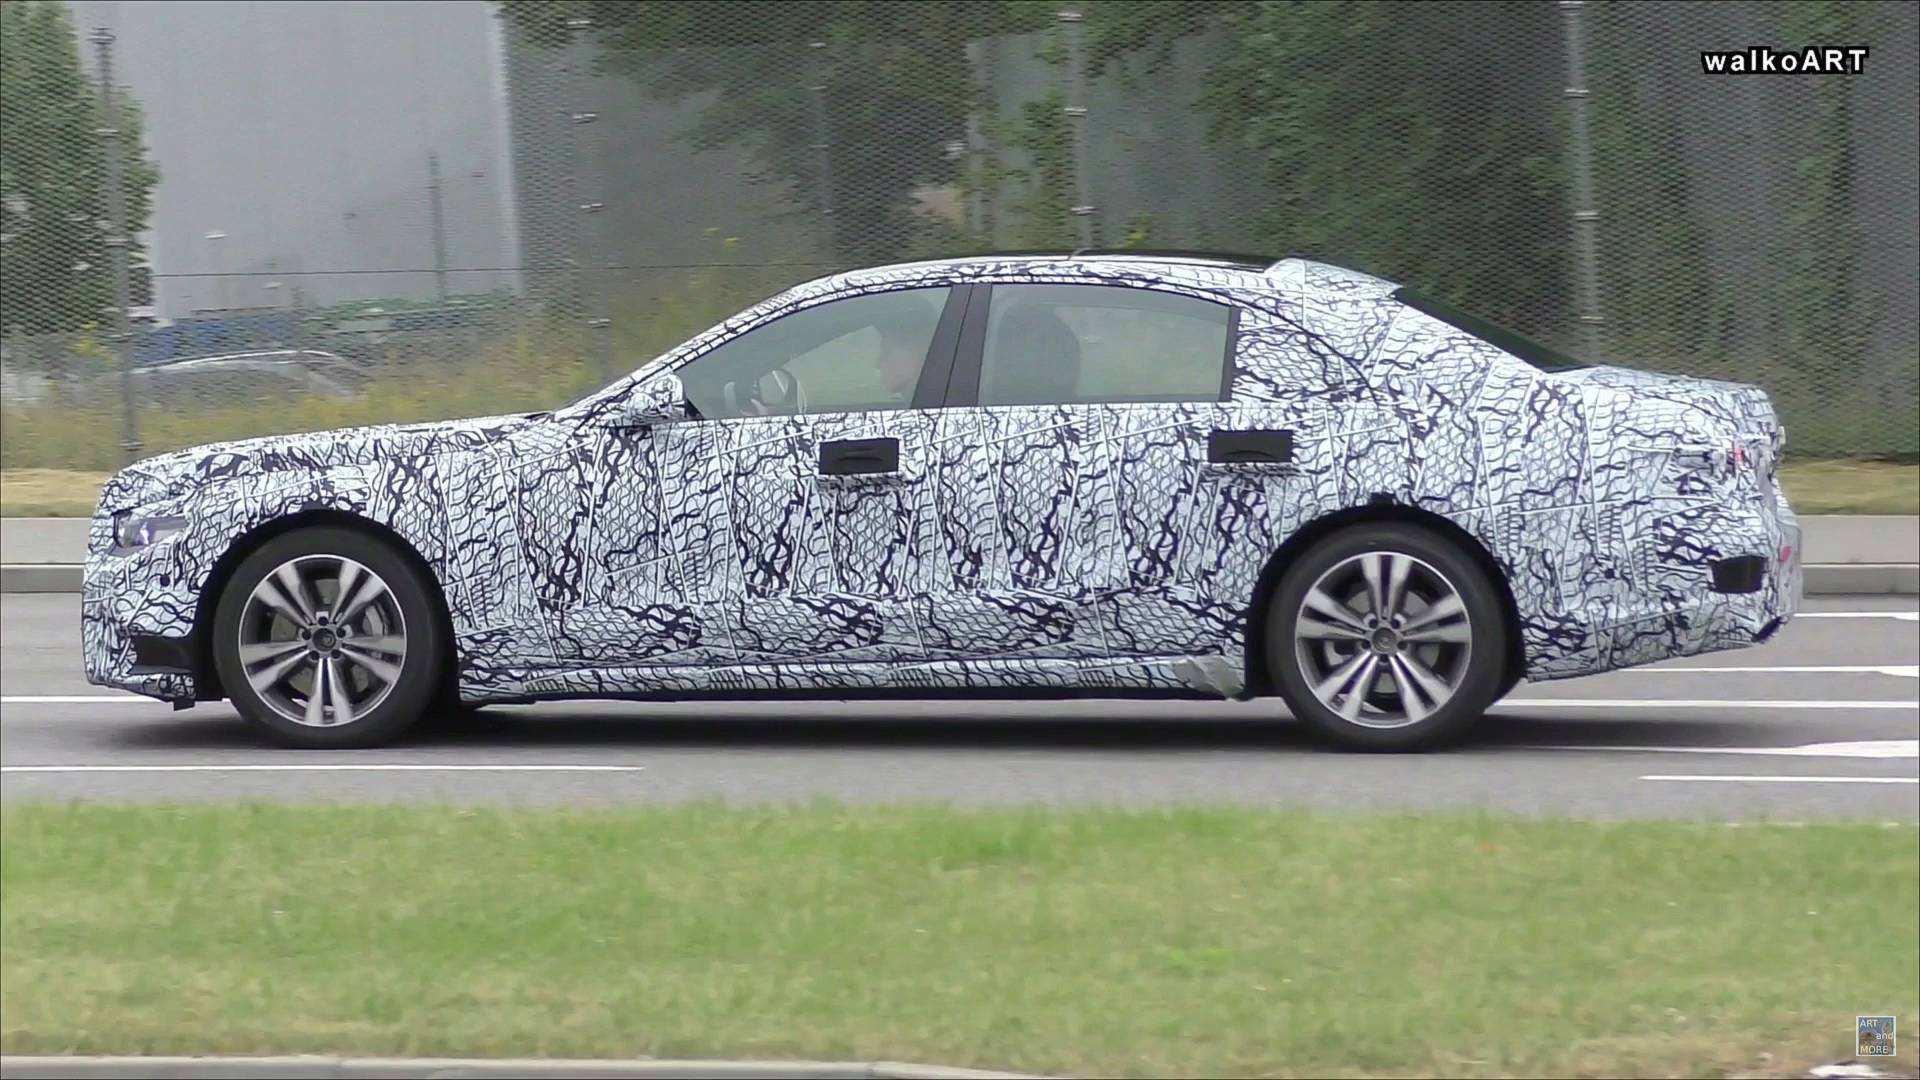 96 Concept of 2020 Mercedes Benz S Class First Drive for 2020 Mercedes Benz S Class